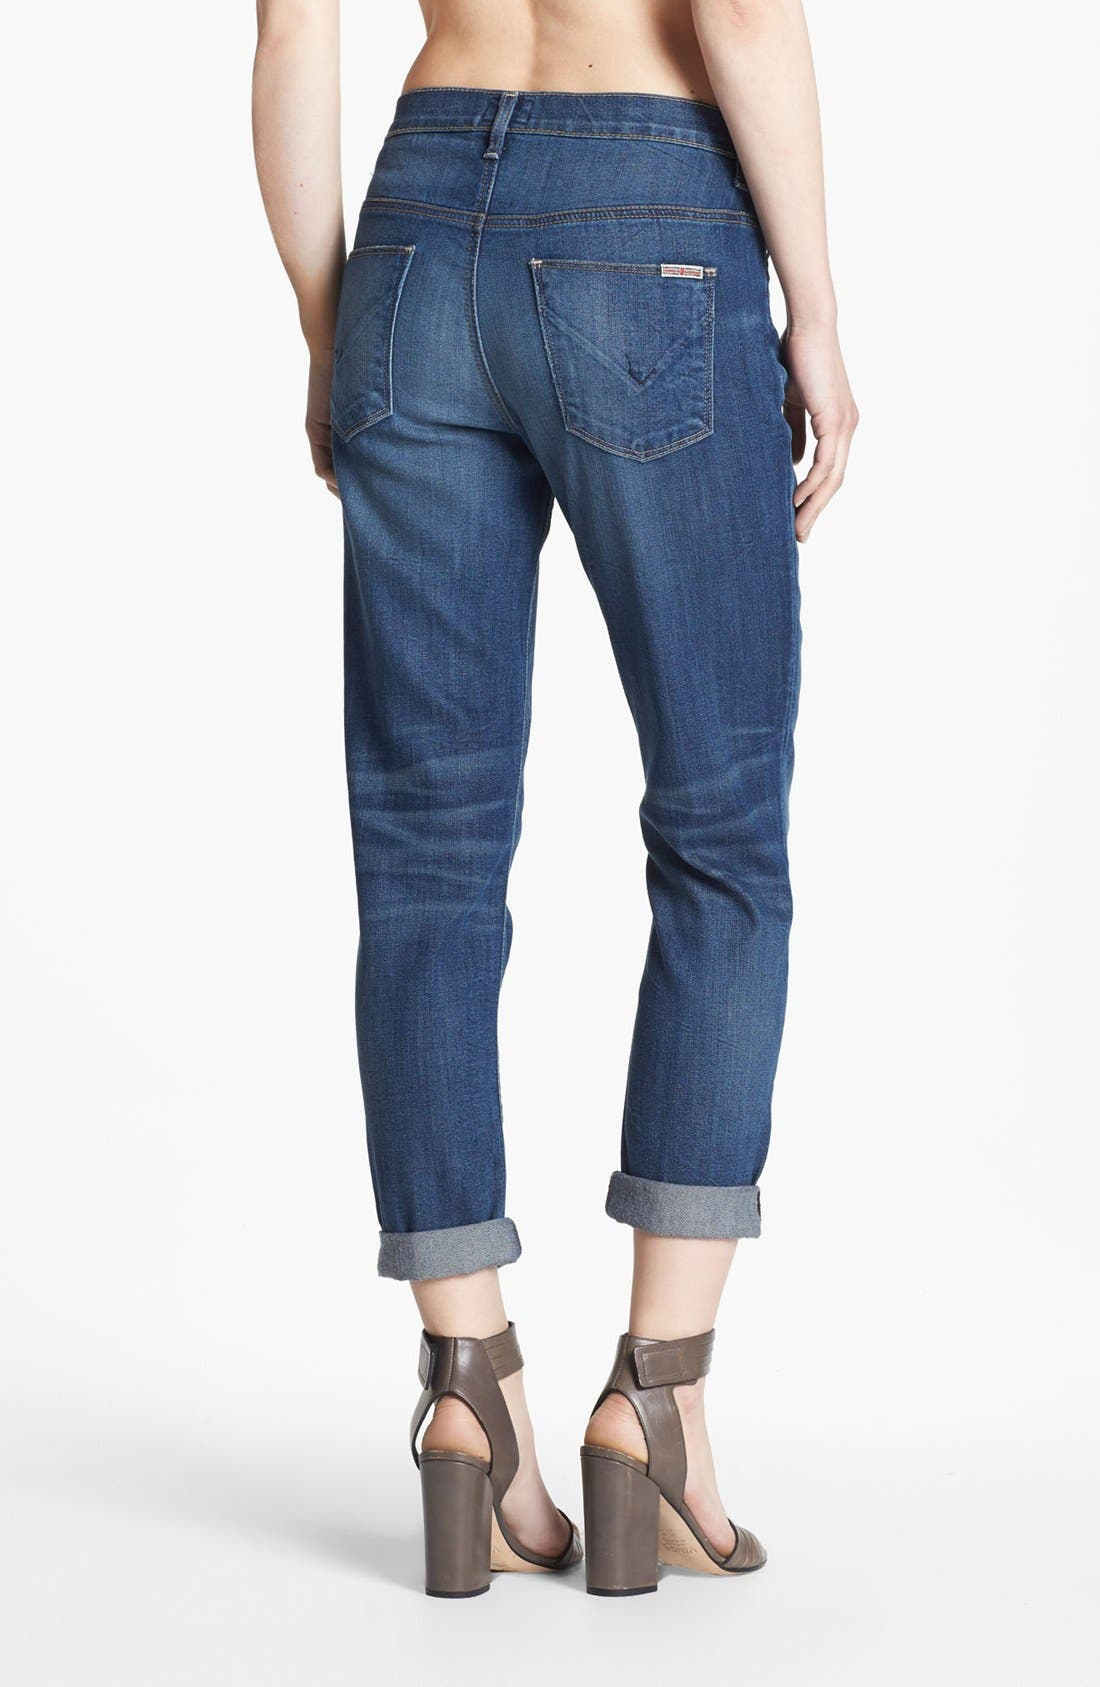 Alternate Image 2  - Hudson Jeans 'Leigh' Boyfriend Jeans (Youth Vintage)